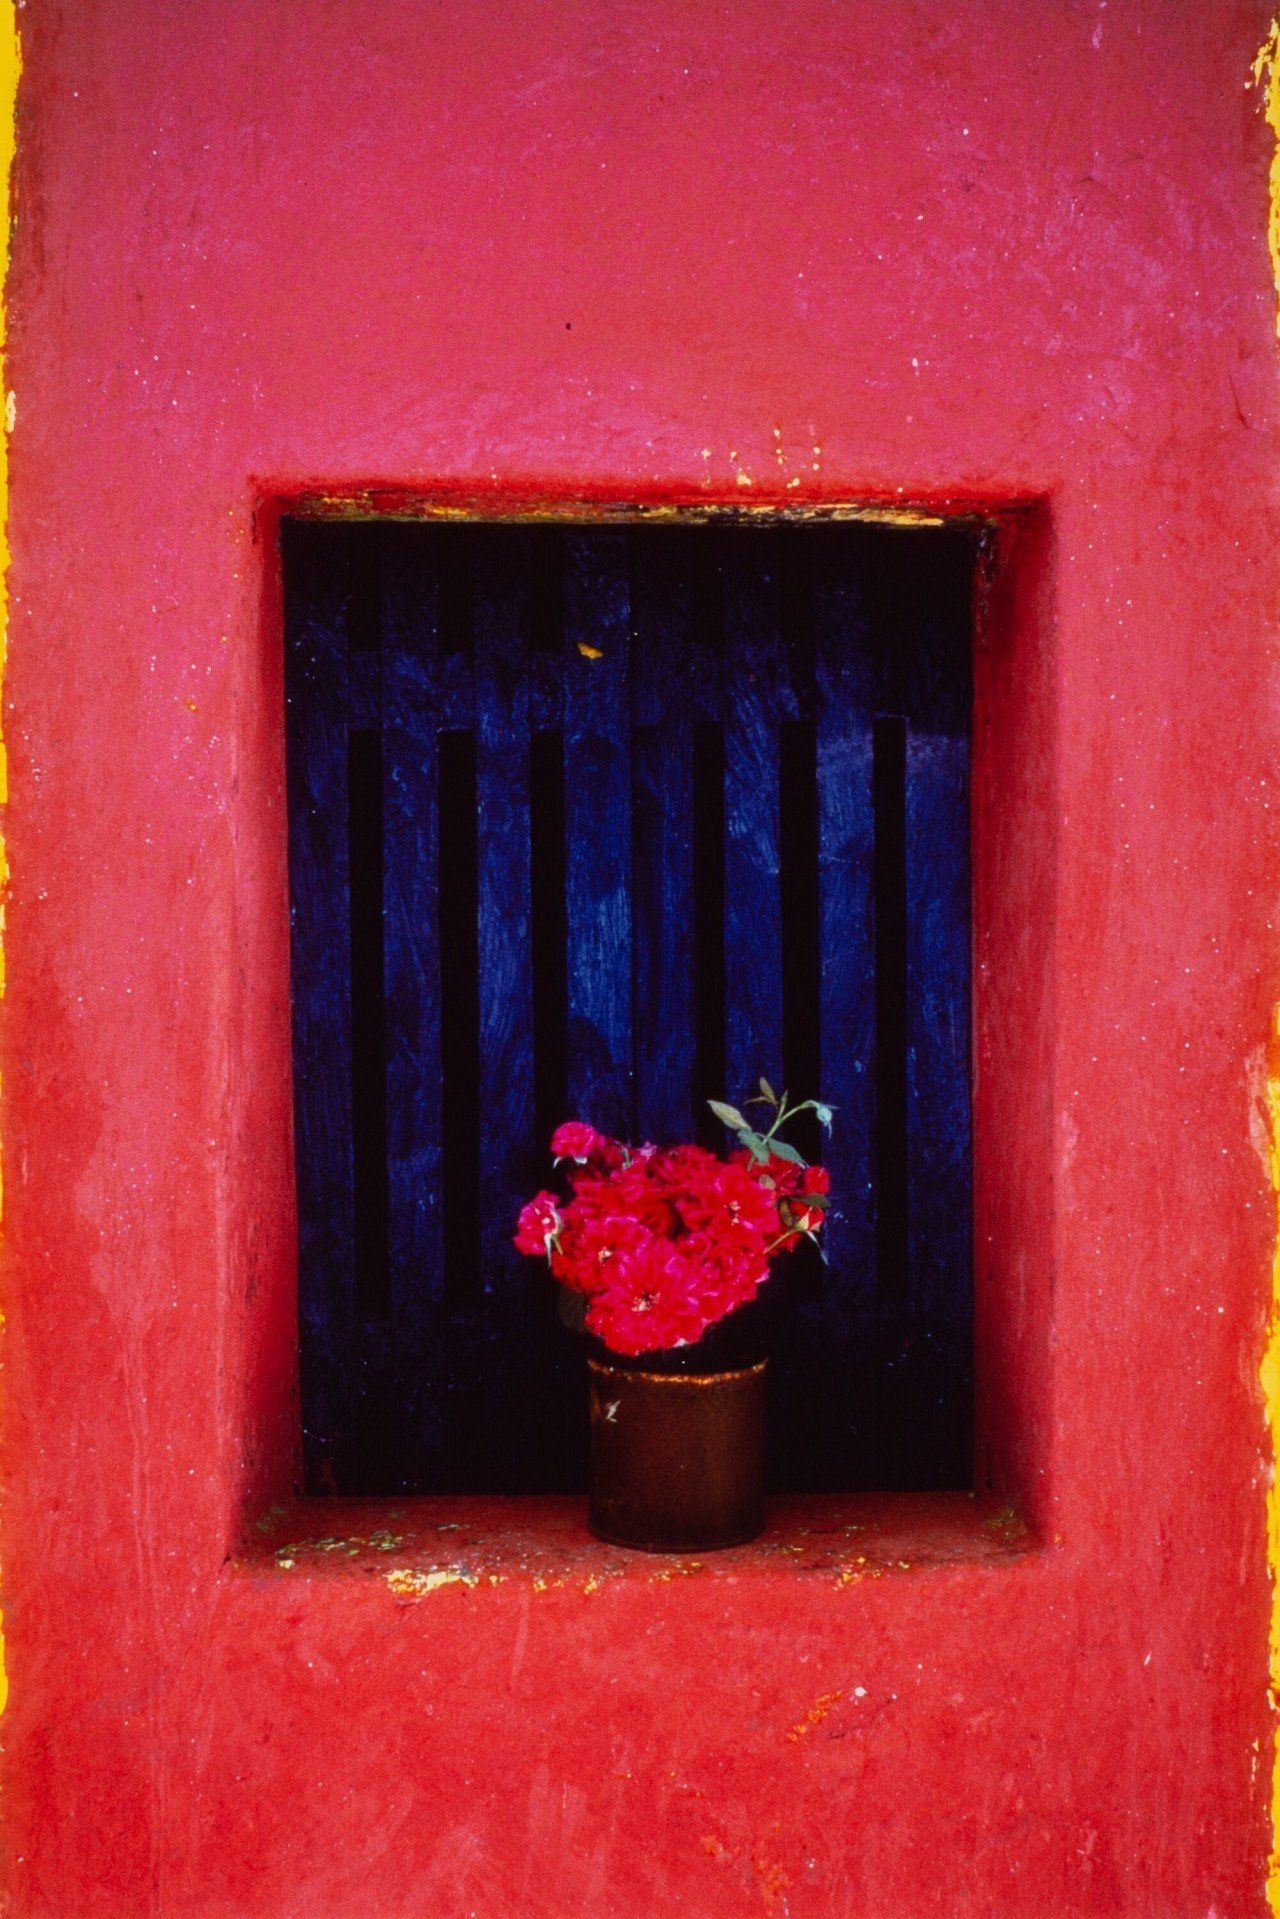 «Врата души». Кампече, Мексика, 1994. Фотограф Джеффри Беком